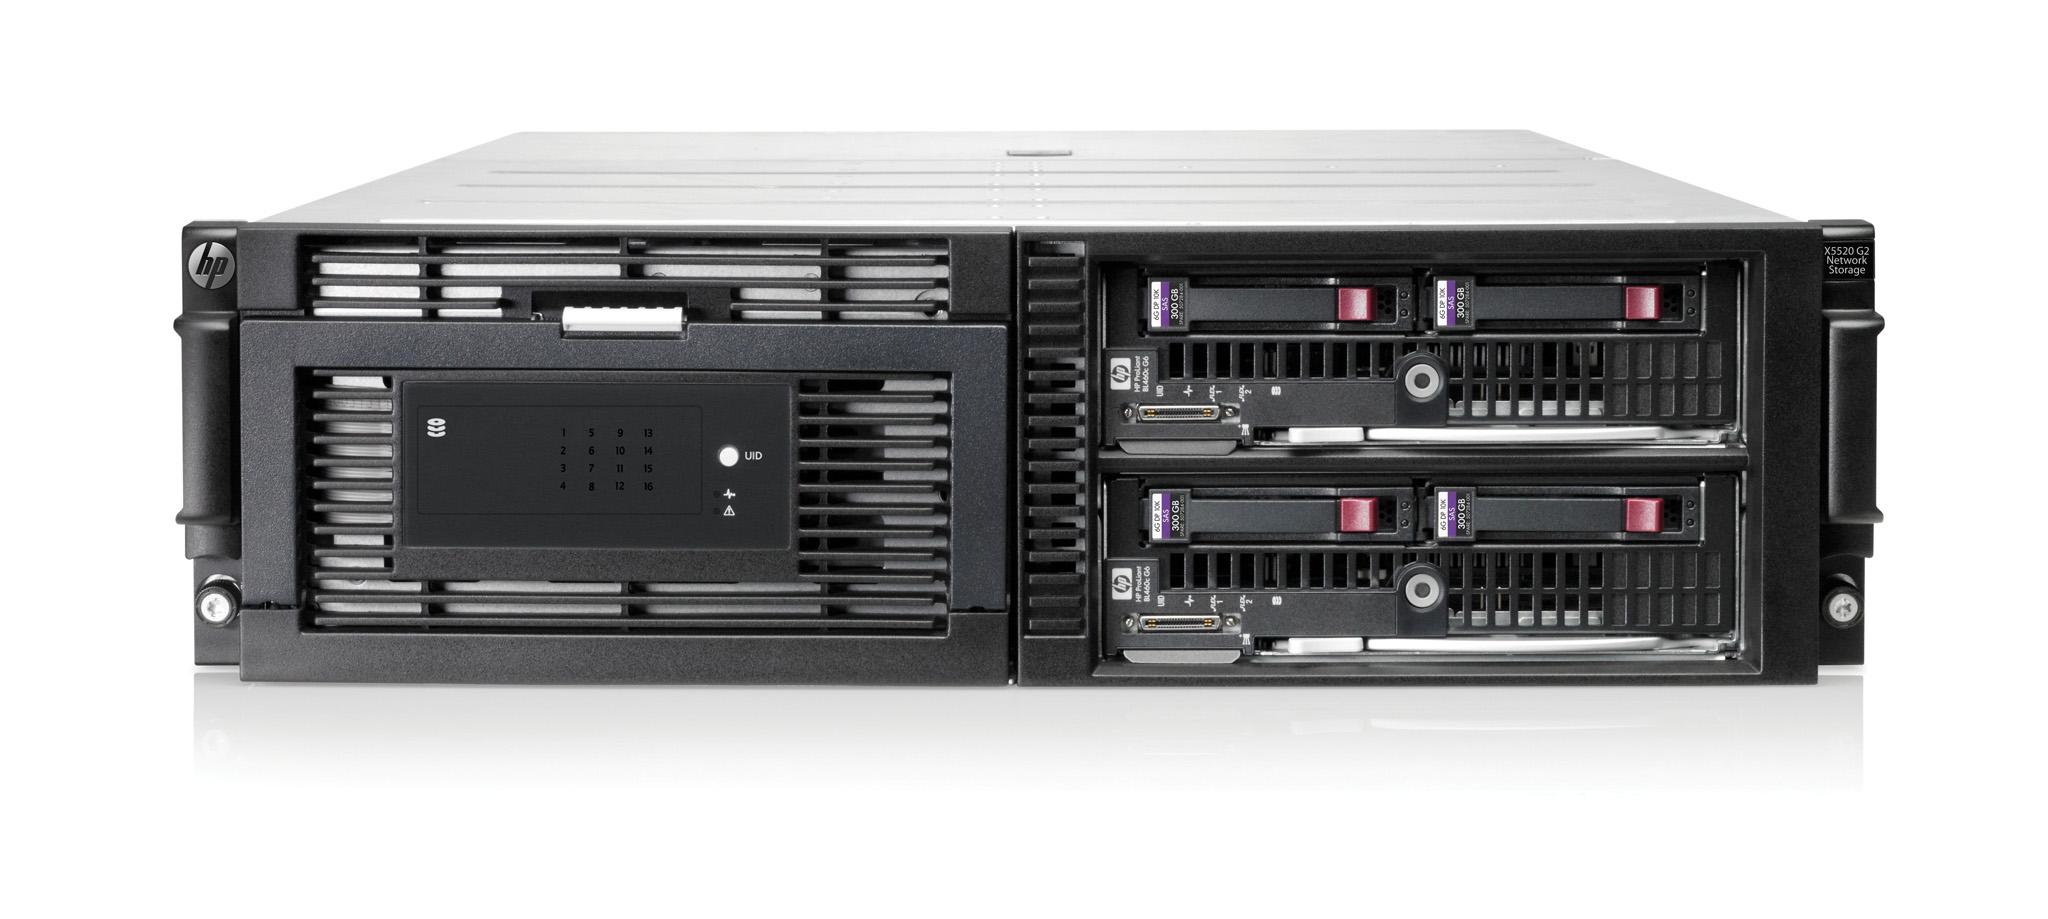 Recupero dati server HP